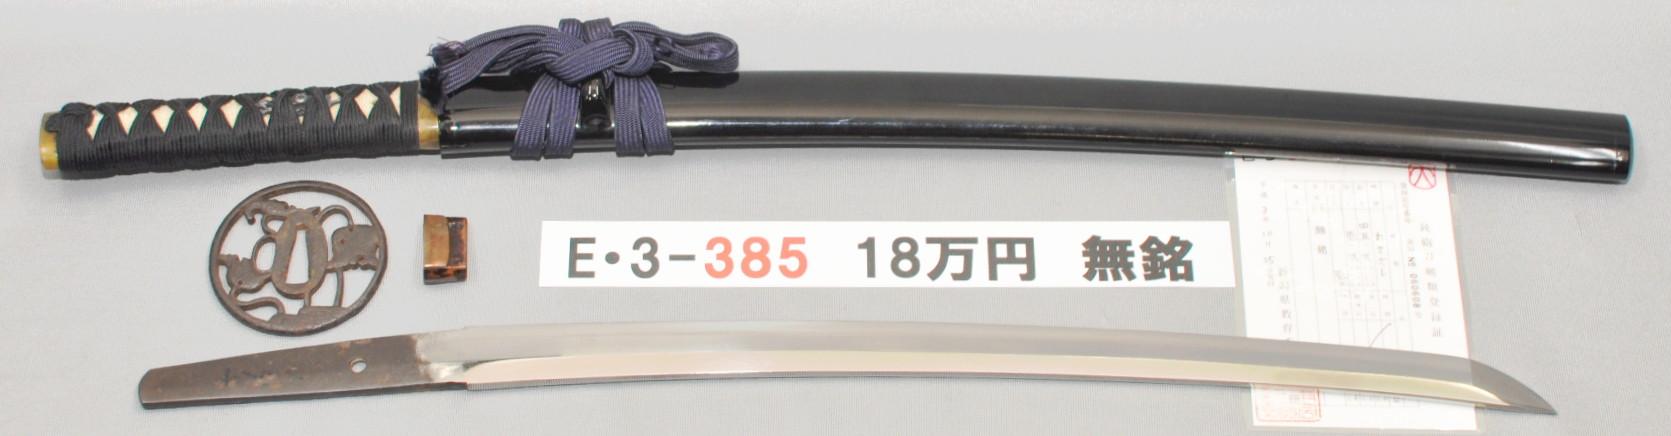 E3385